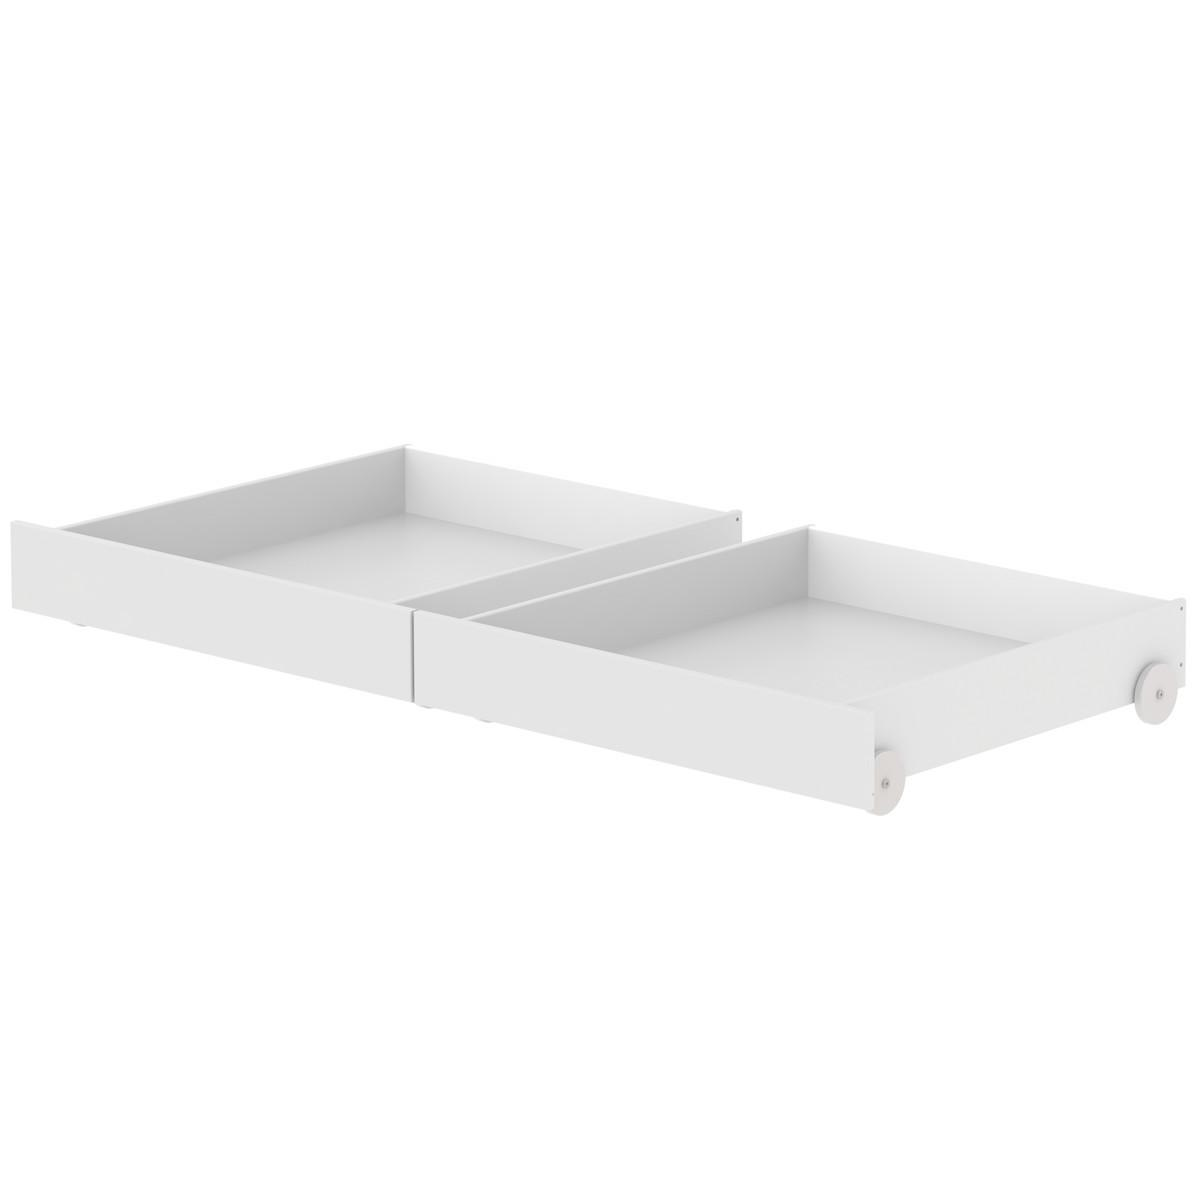 2 tiroirs lit 90x200cm WHITE Flexa blanc